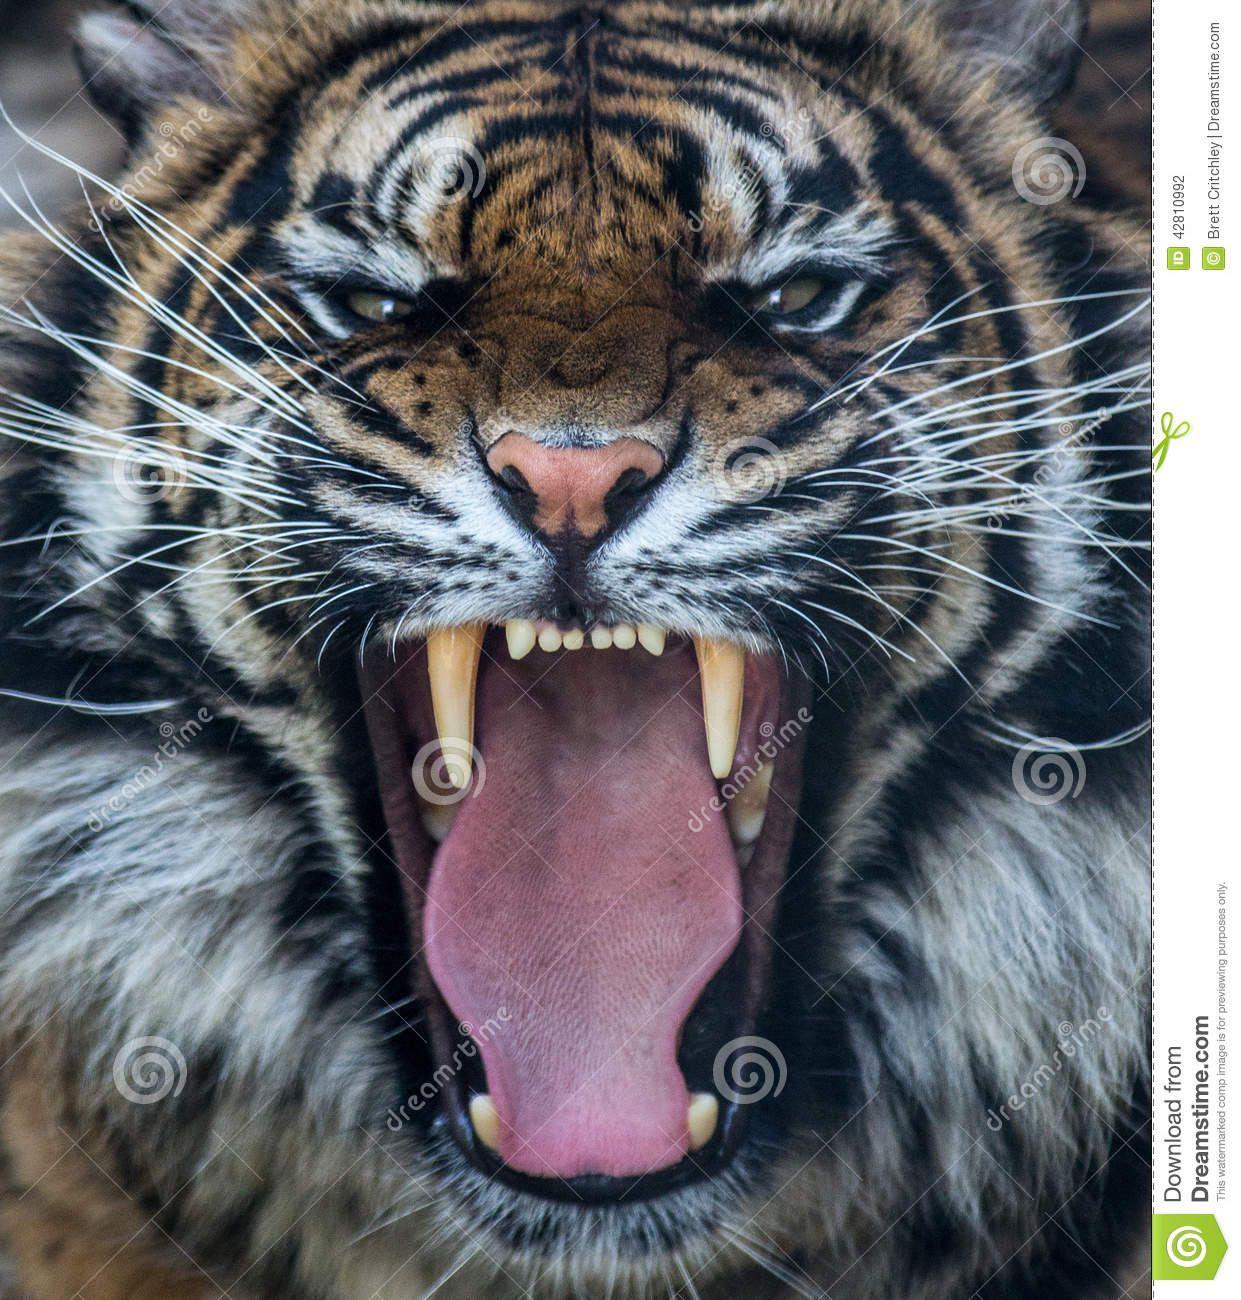 Angry Lion Wallpaper Hd 1080p Sumatran Tiger Roar Leo Tiger Roaring Endangered